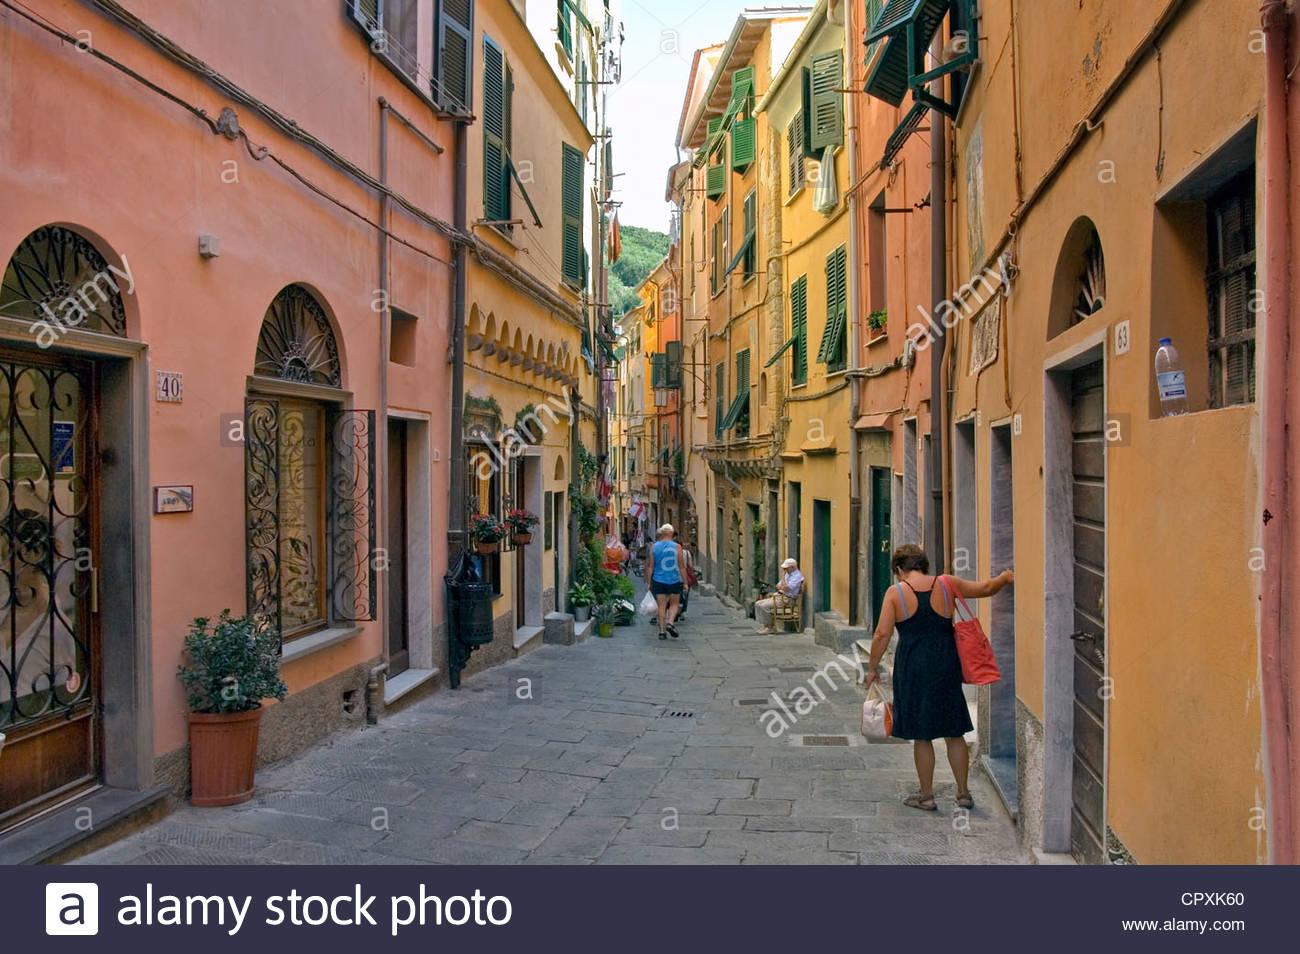 Alte Stadt Portovenere, Ligurien, Nord-West-Italien | Altstadt von Portovenere, Ligurien, Italien Stockbild